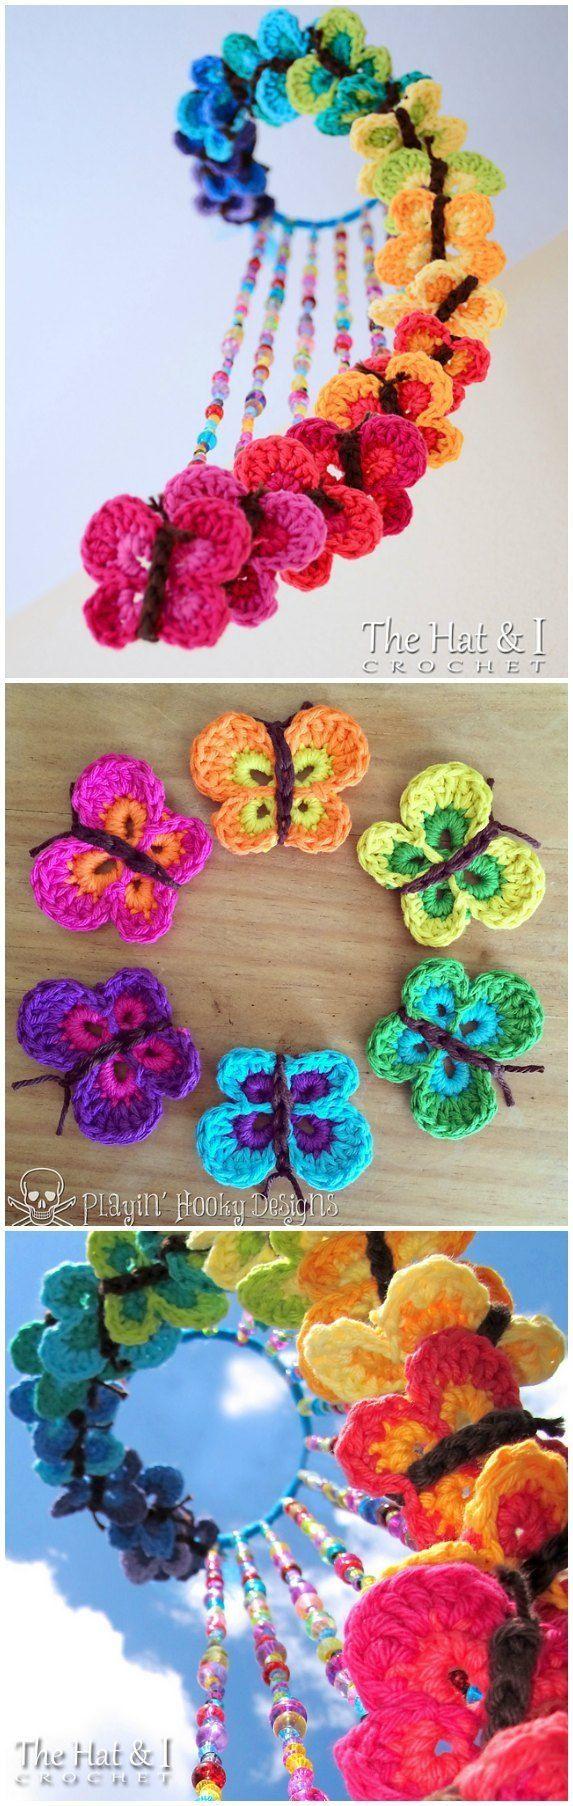 Crochet Butterfly Mobile Free Pattern | Pinterest | Mobiles ...